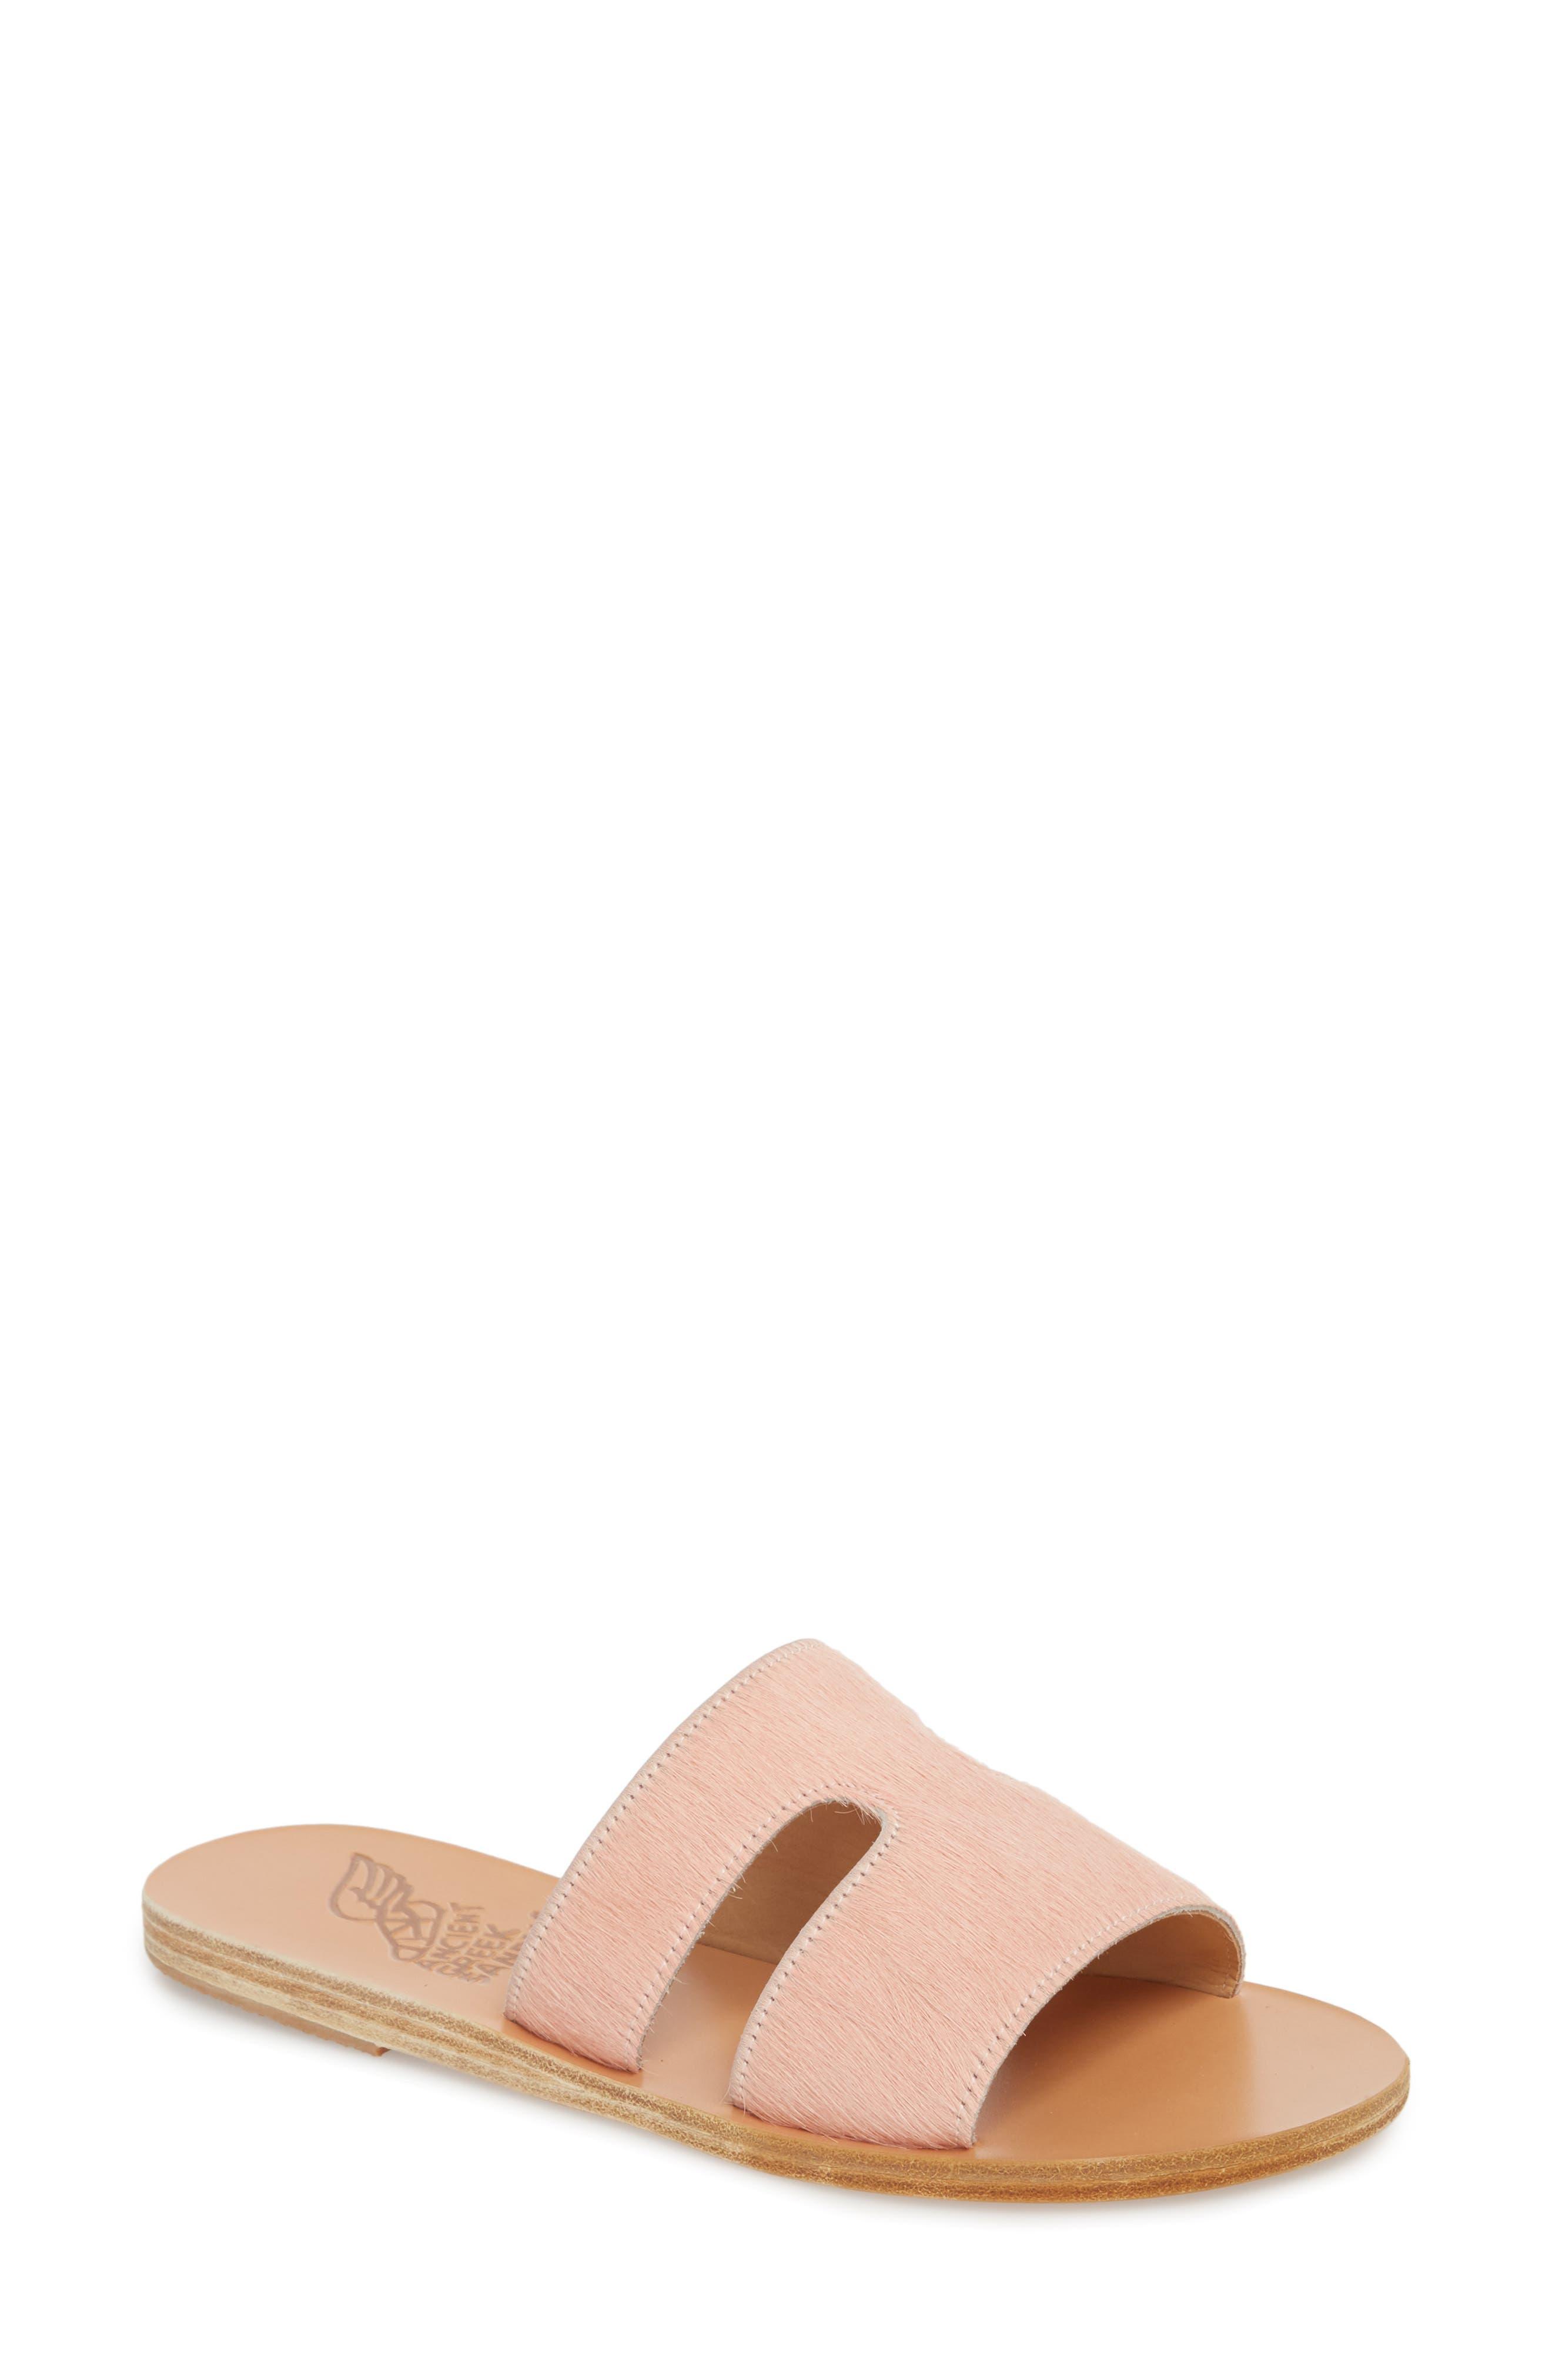 Apteros Genuine Calf Hair Slide Sandal,                         Main,                         color, Pink Pony